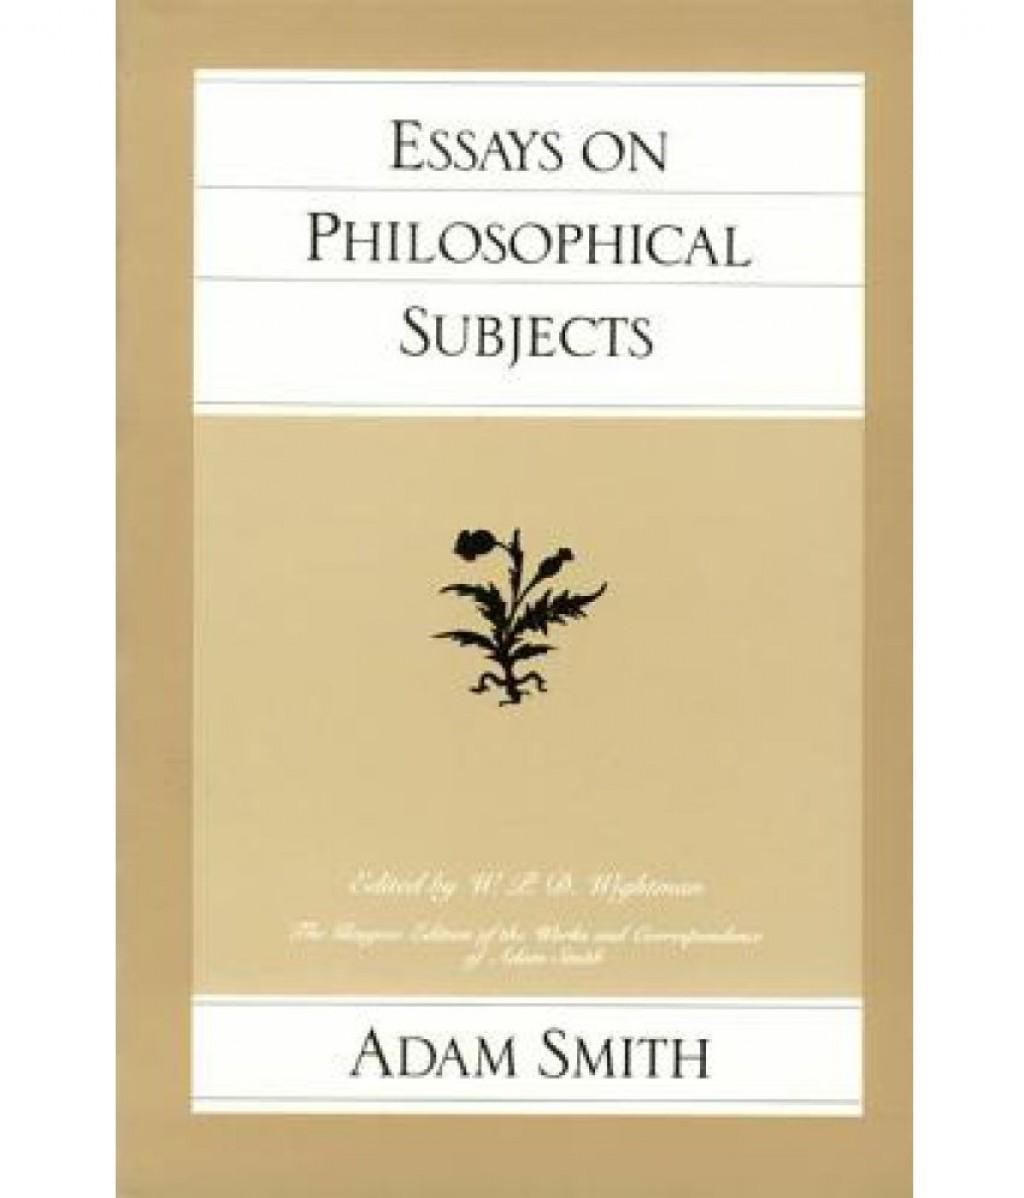 011 Essays On Philosophical Subjects Sdl274222681 Essay Best Smith Pdf Large